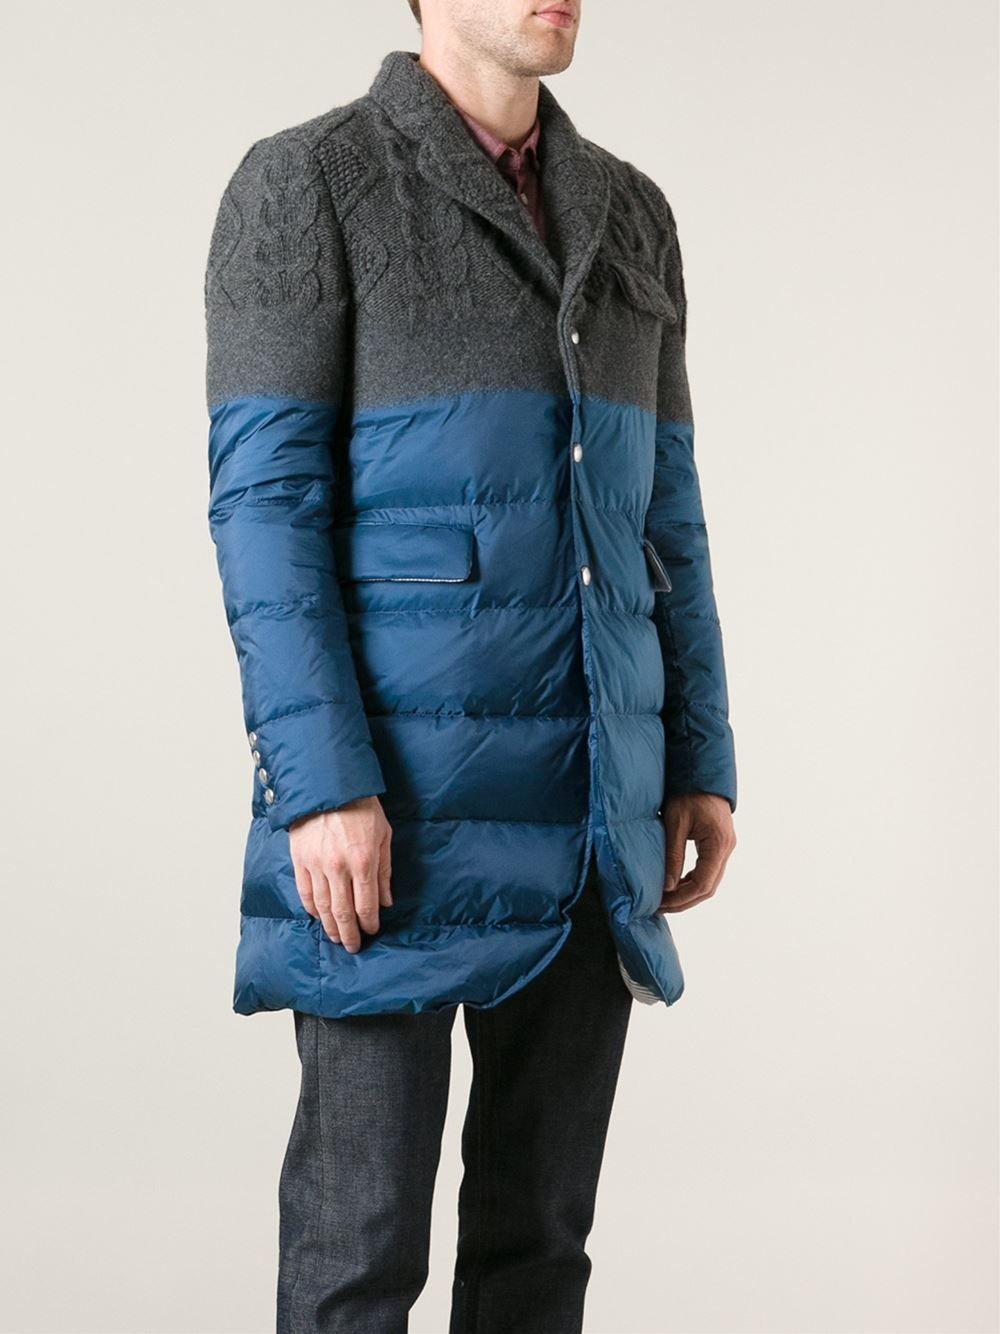 Moncler Gamme Bleu Padded Jacket 포함